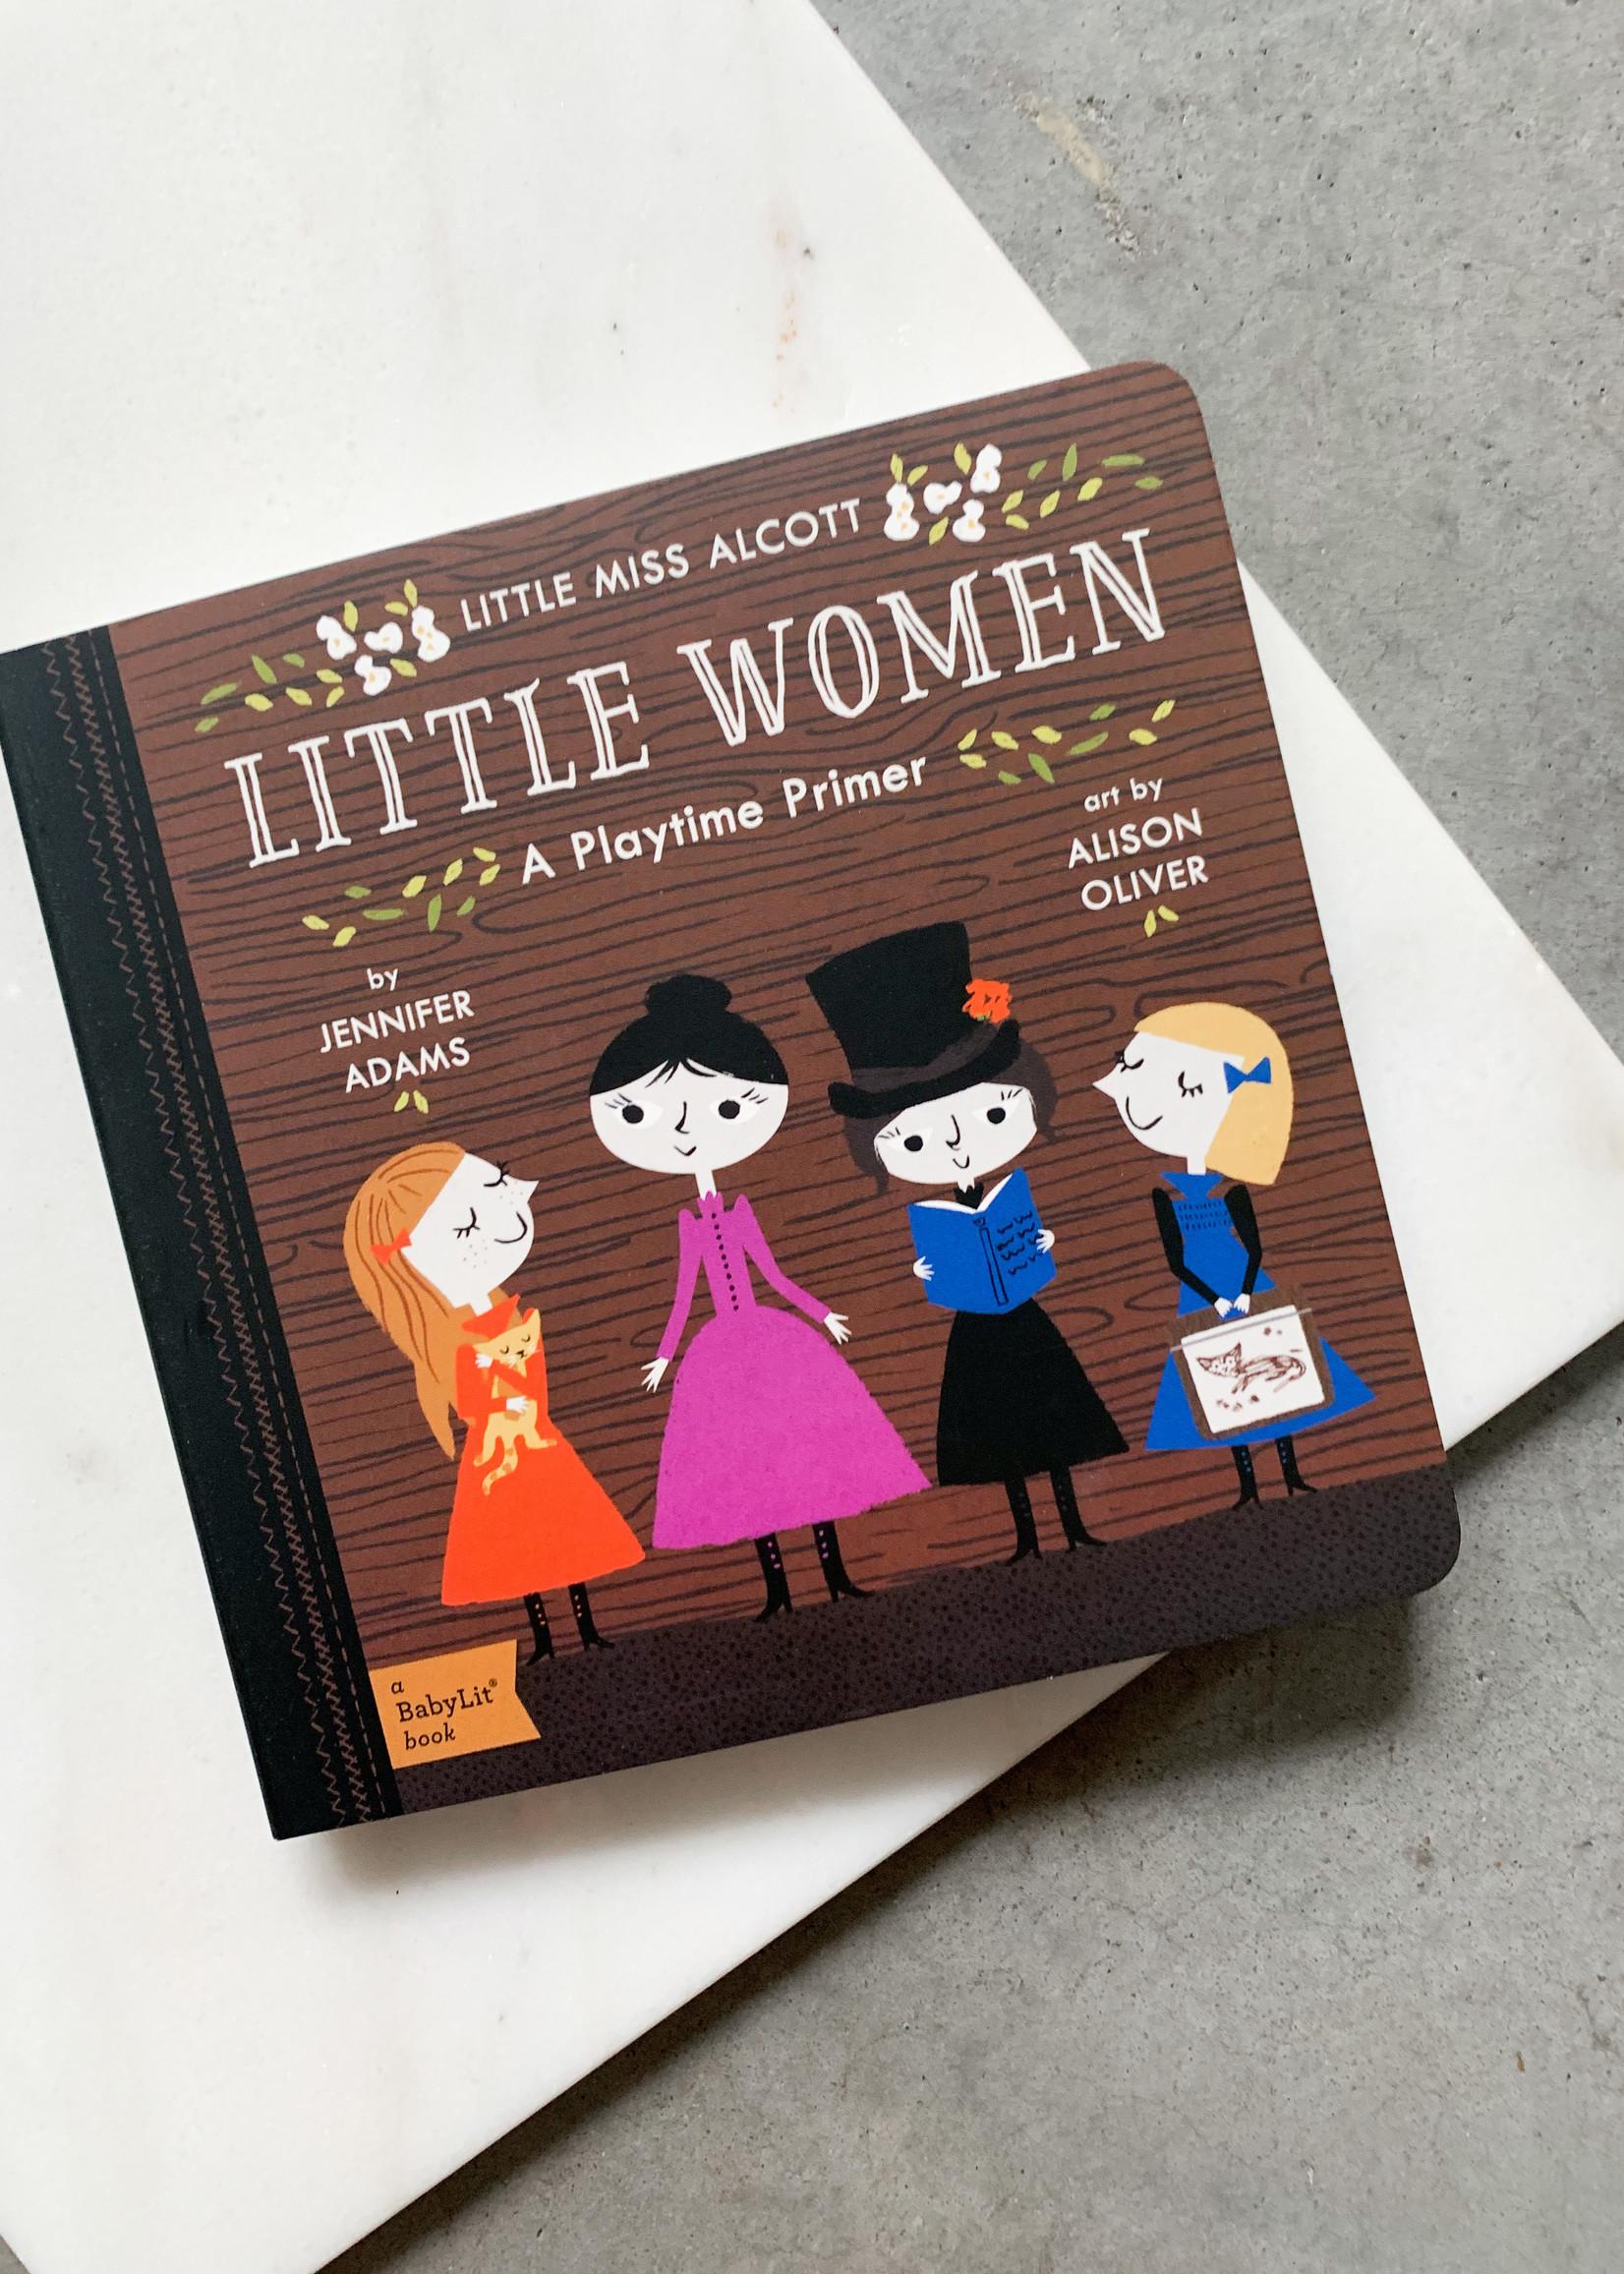 Elitaire Petite Little Women